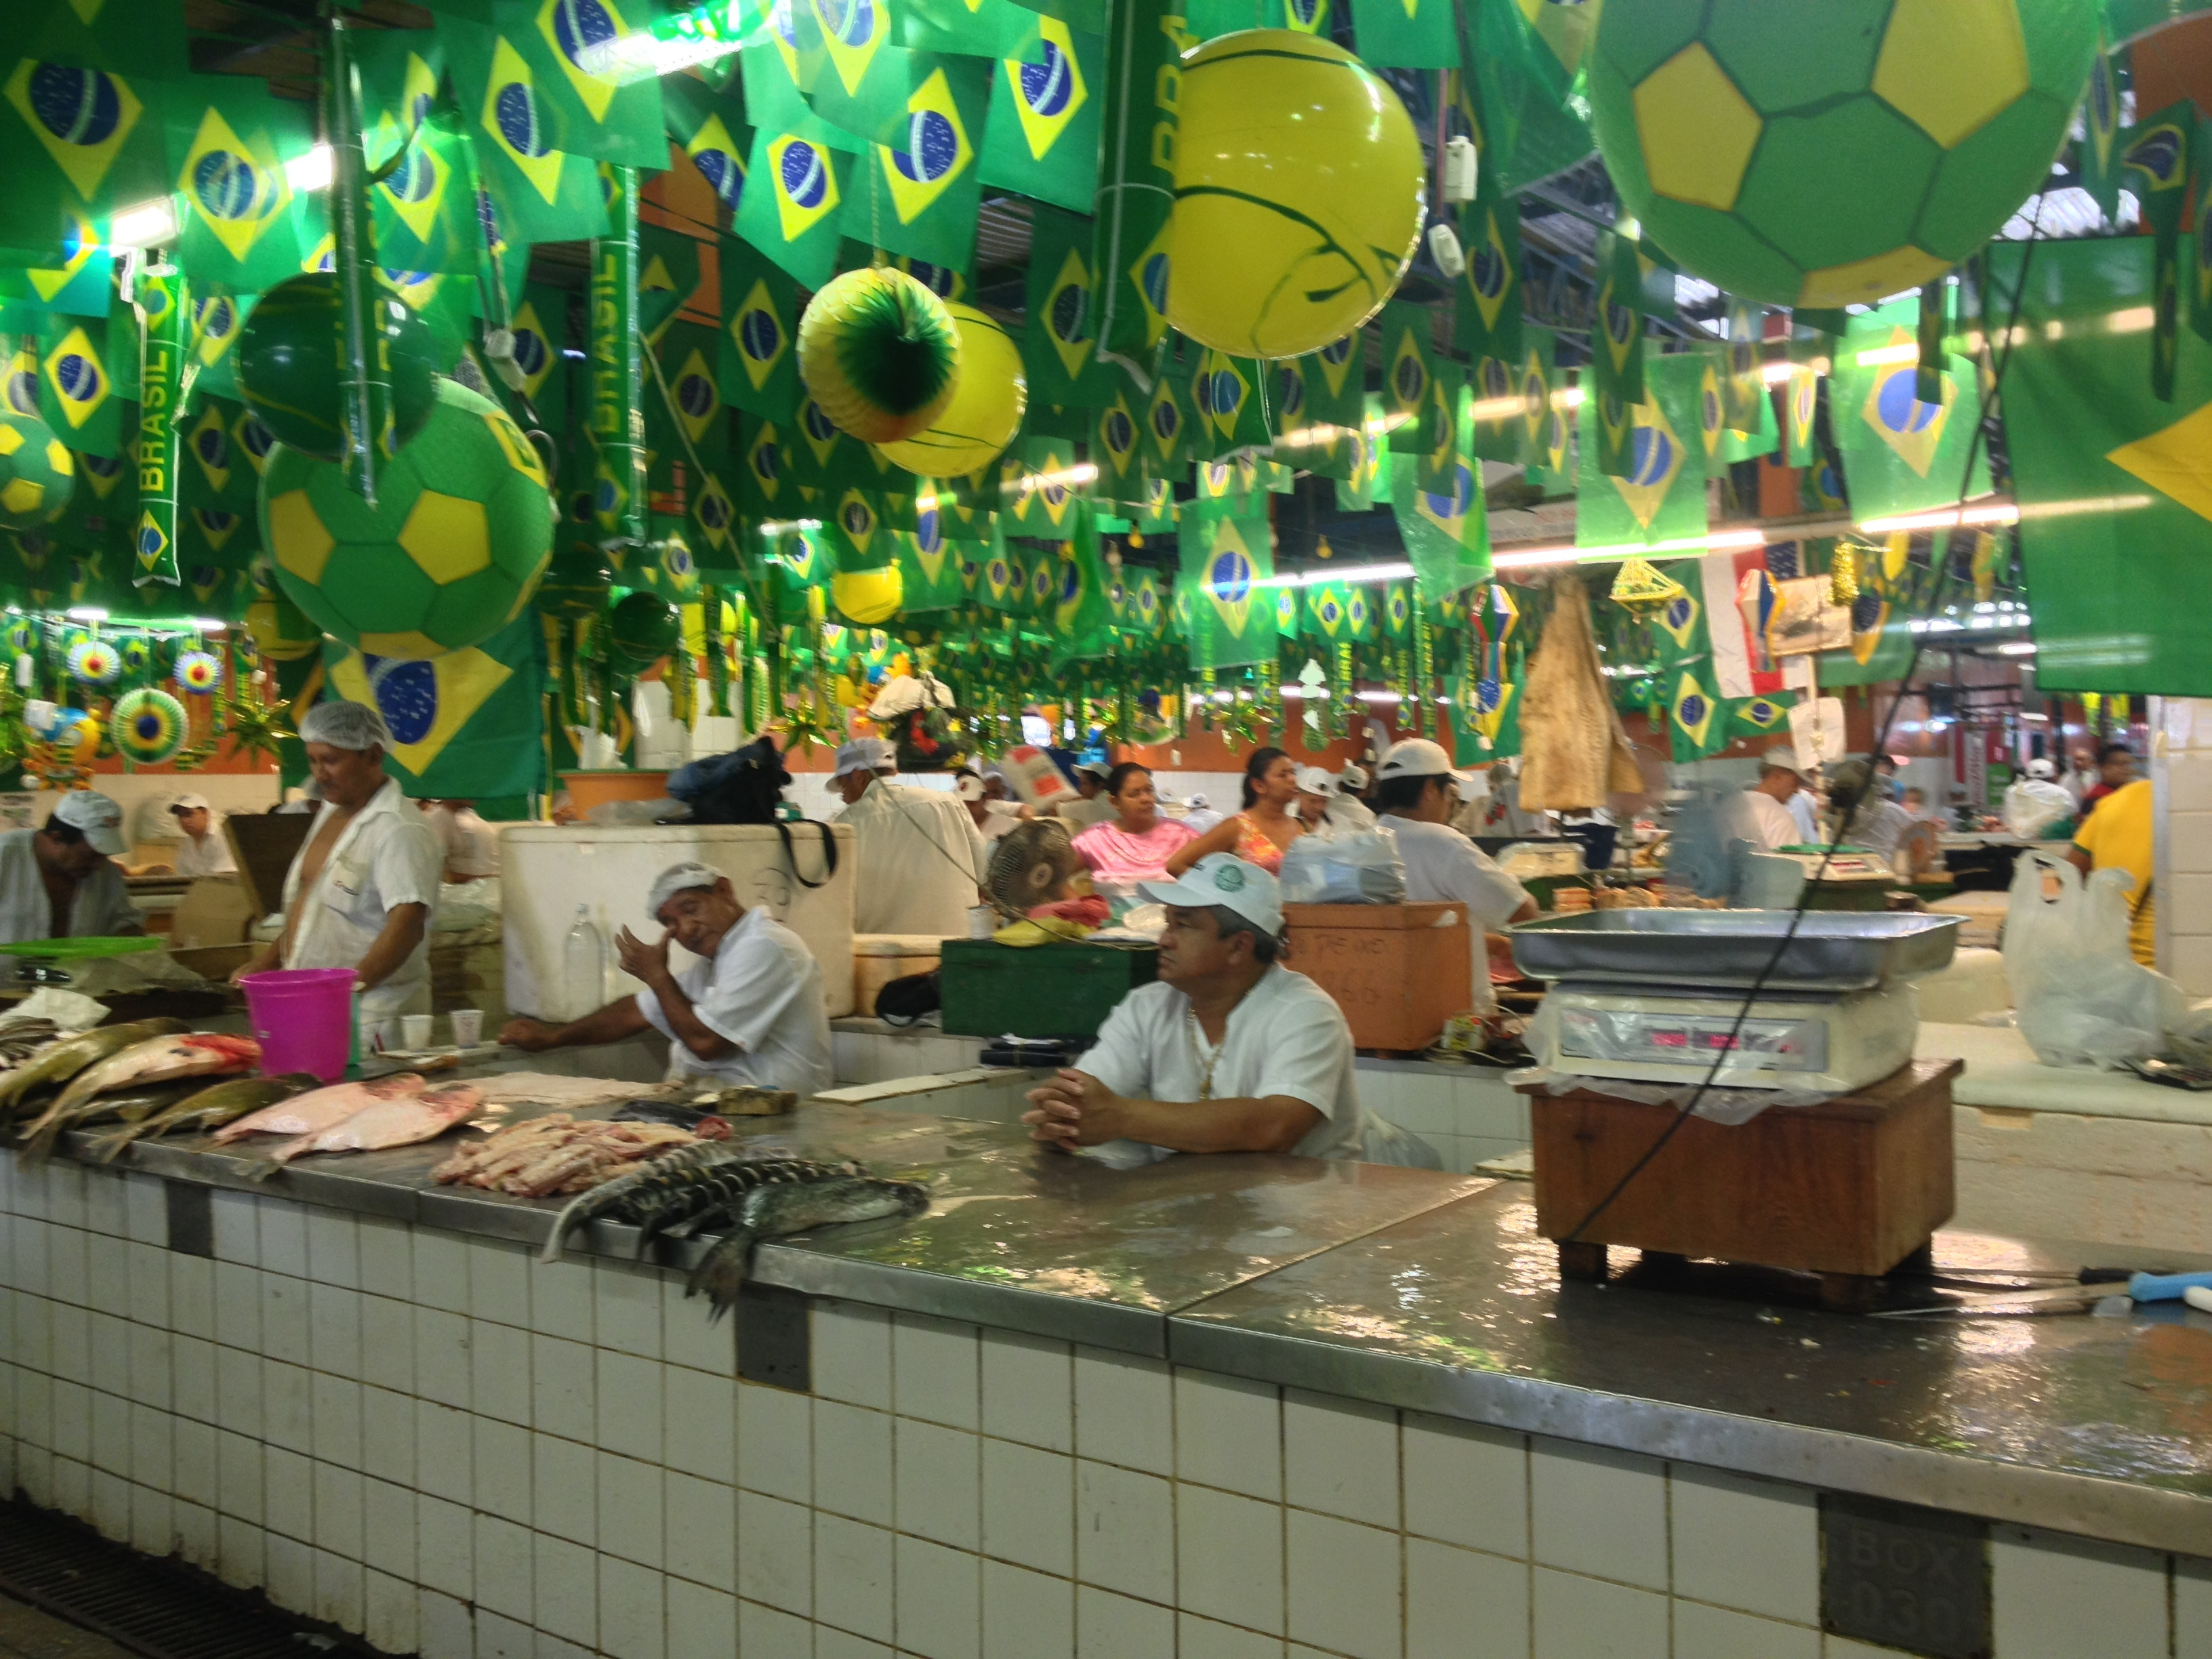 Brazilians are crazy over Brazil